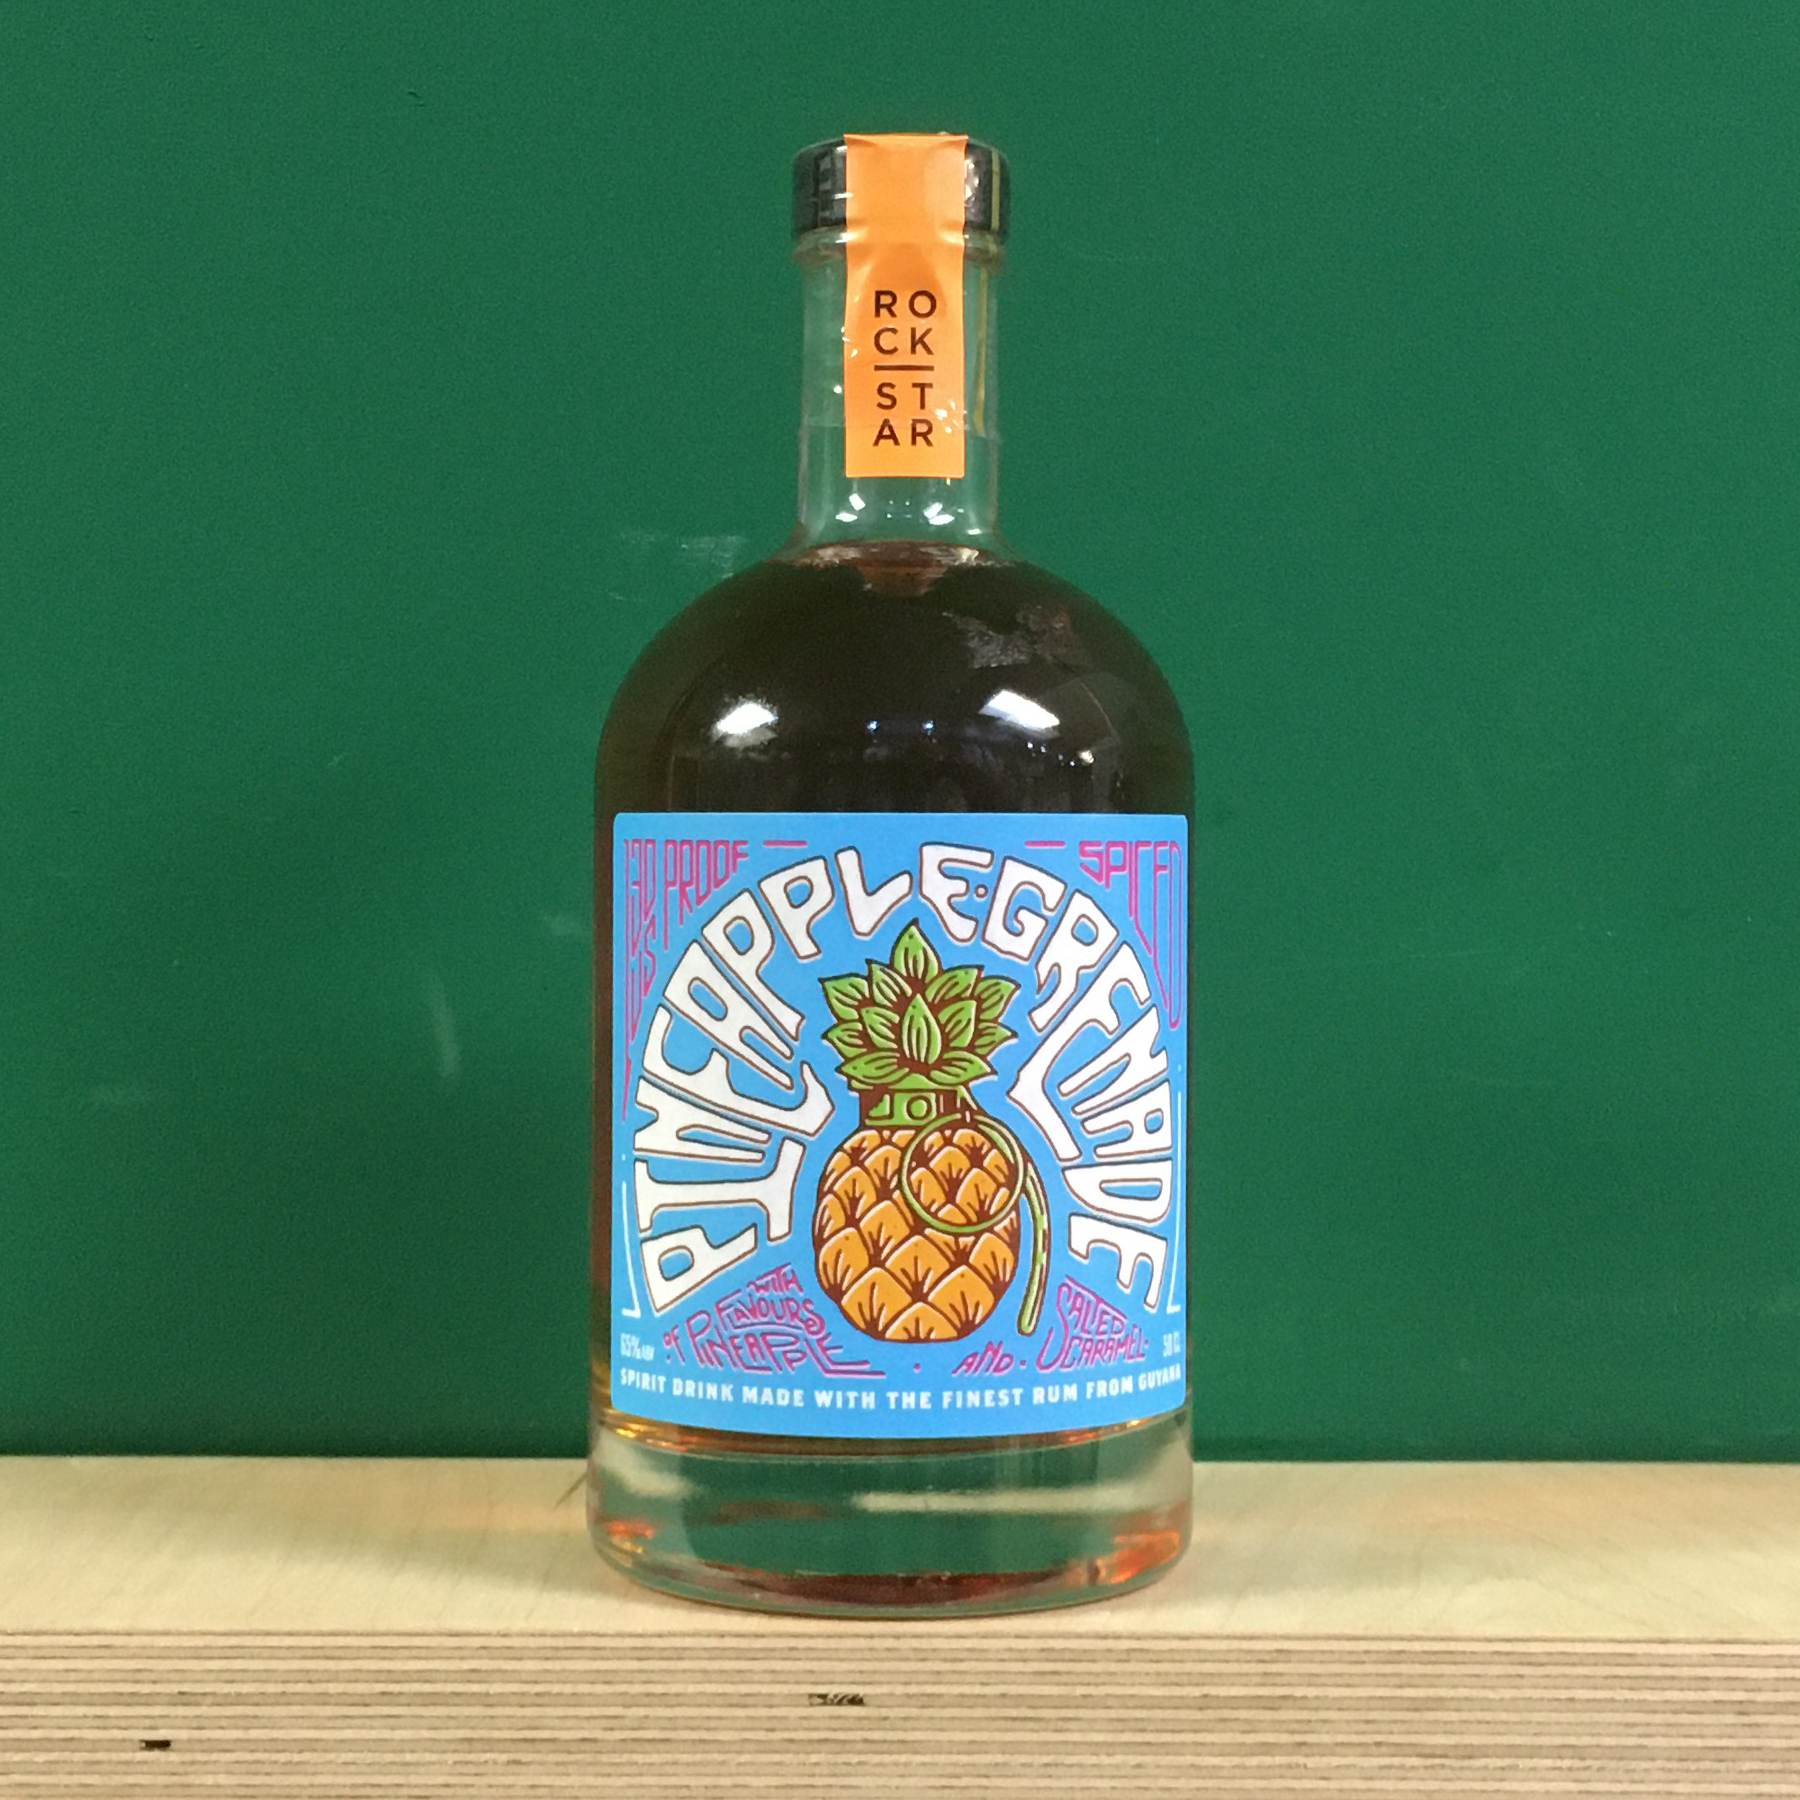 Rockstar Pineapple Grenade Rum